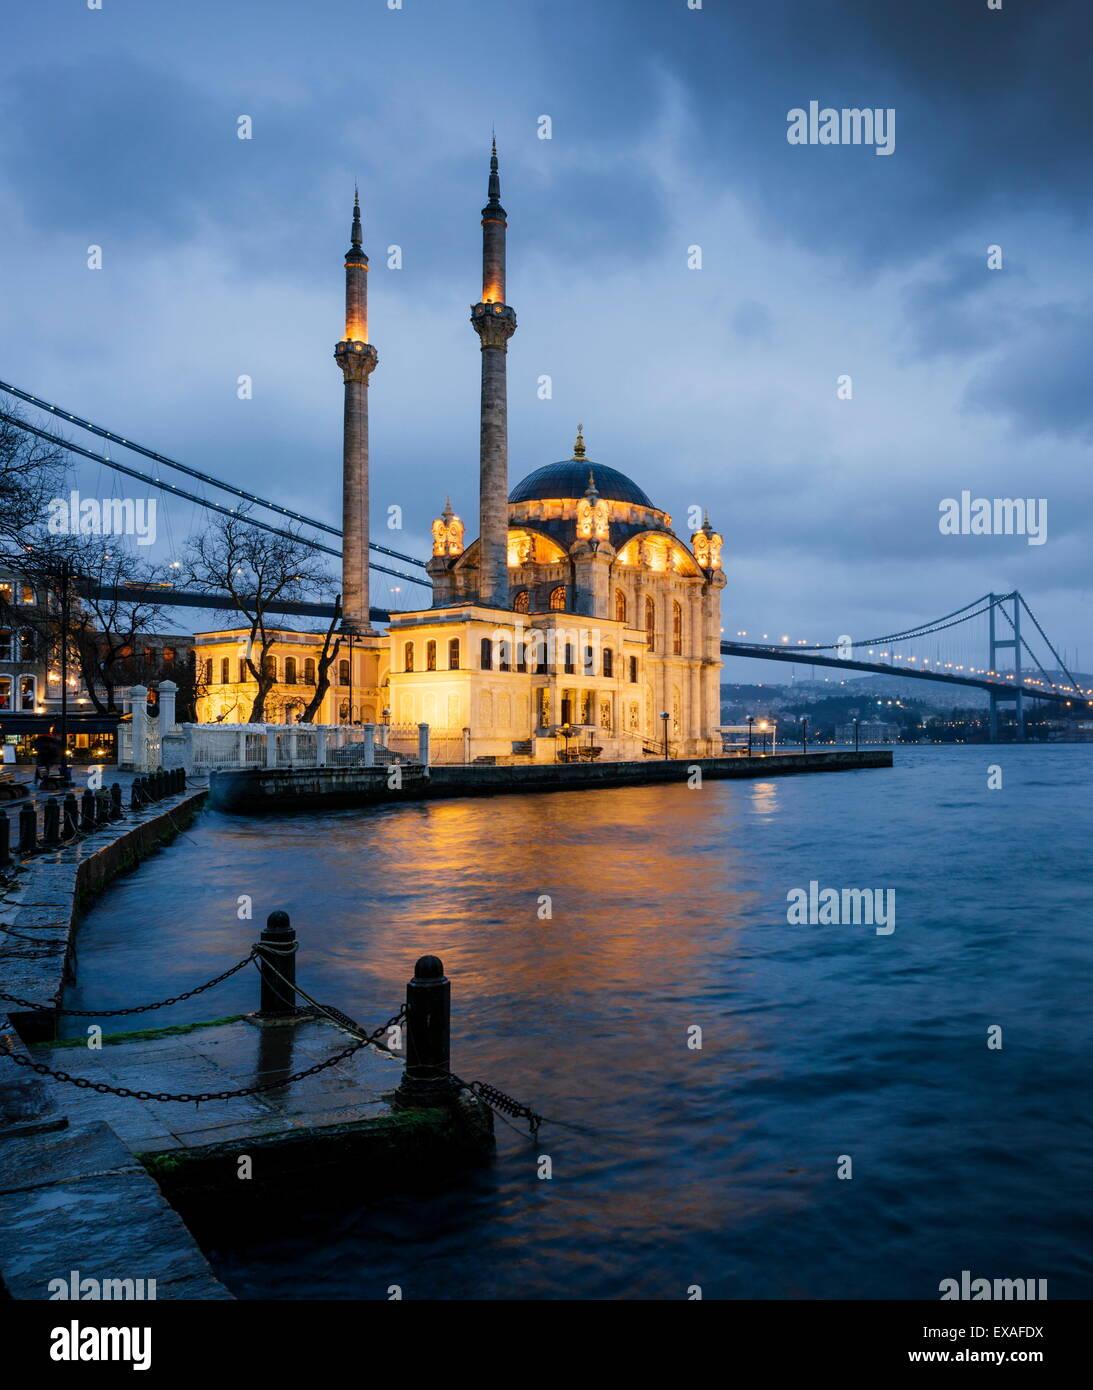 Äußere Ortakoy-Moschee und die Bosporus-Brücke bei Nacht, Ortakoy, Istanbul, Türkei, Europa Stockbild